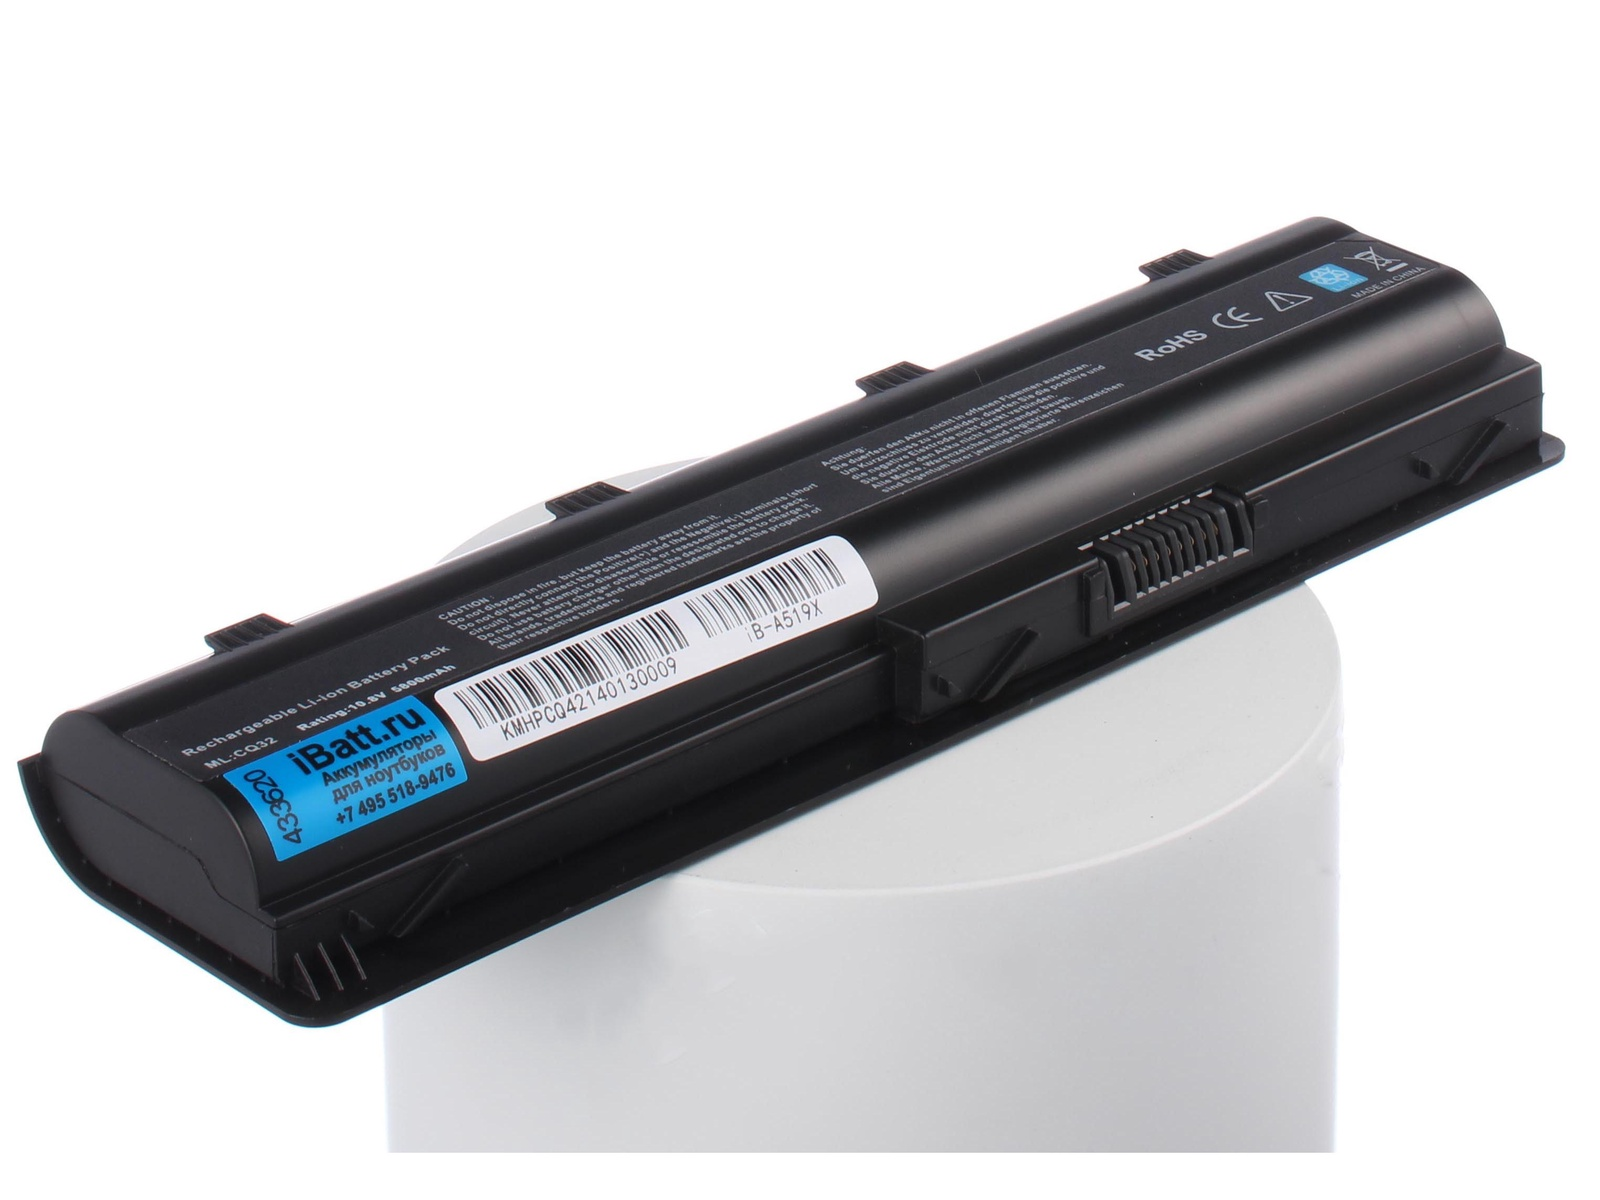 Аккумулятор для ноутбука iBatt для HP-Compaq Pavilion g6-2004er, Pavilion dv6-6077er, Pavilion dv6-3106er, Pavilion g6-1317sr, Pavilion g6-1000, Pavilion g6-1358er, 2000-2d00SR, Pavilion dv6-6b53er, Pavilion dv6-3057er iBatt